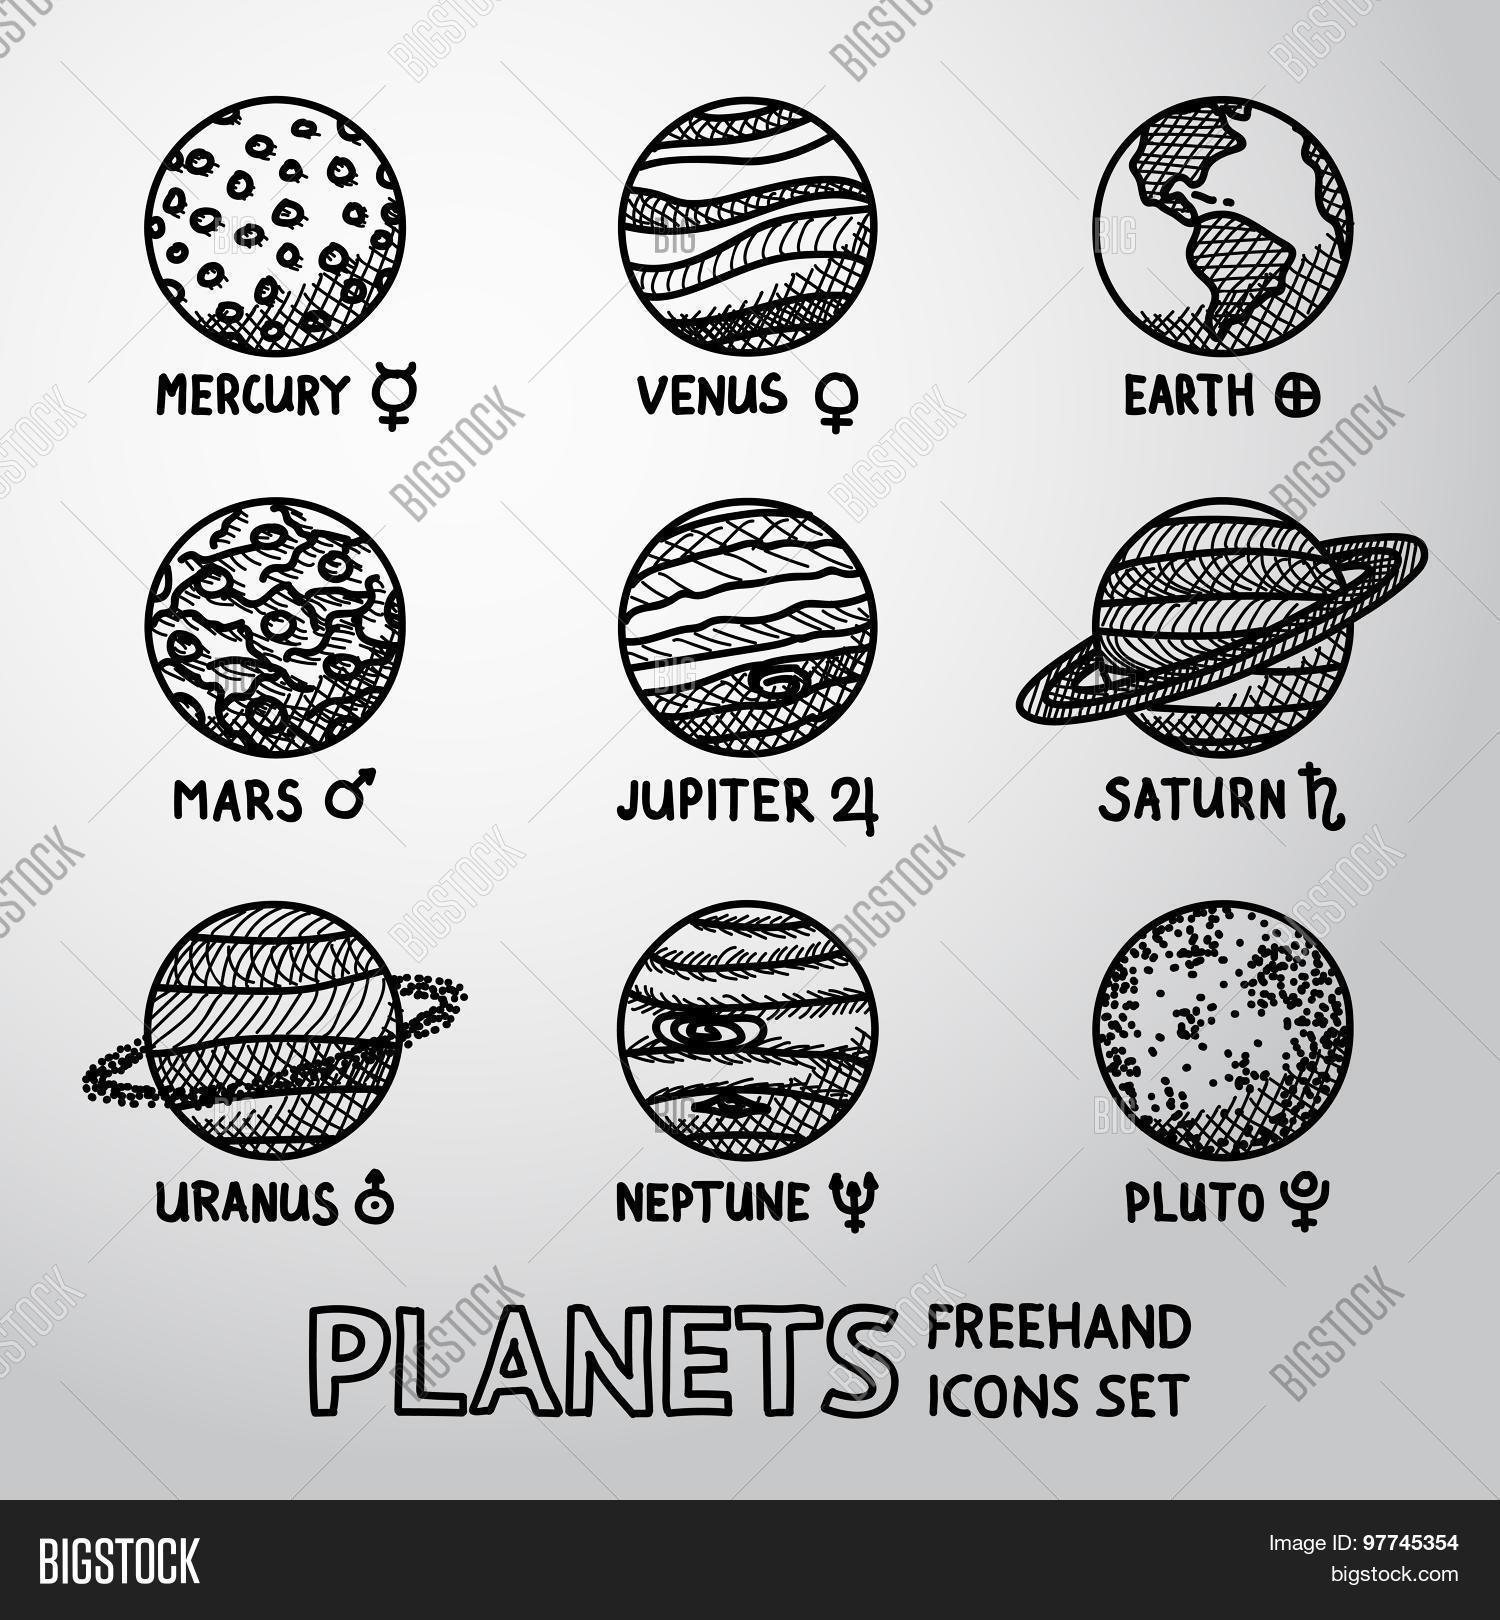 Set hand drawn planet icons names vector photo bigstock set of hand drawn planet icons with names and astronomical symbols mercury venus biocorpaavc Choice Image